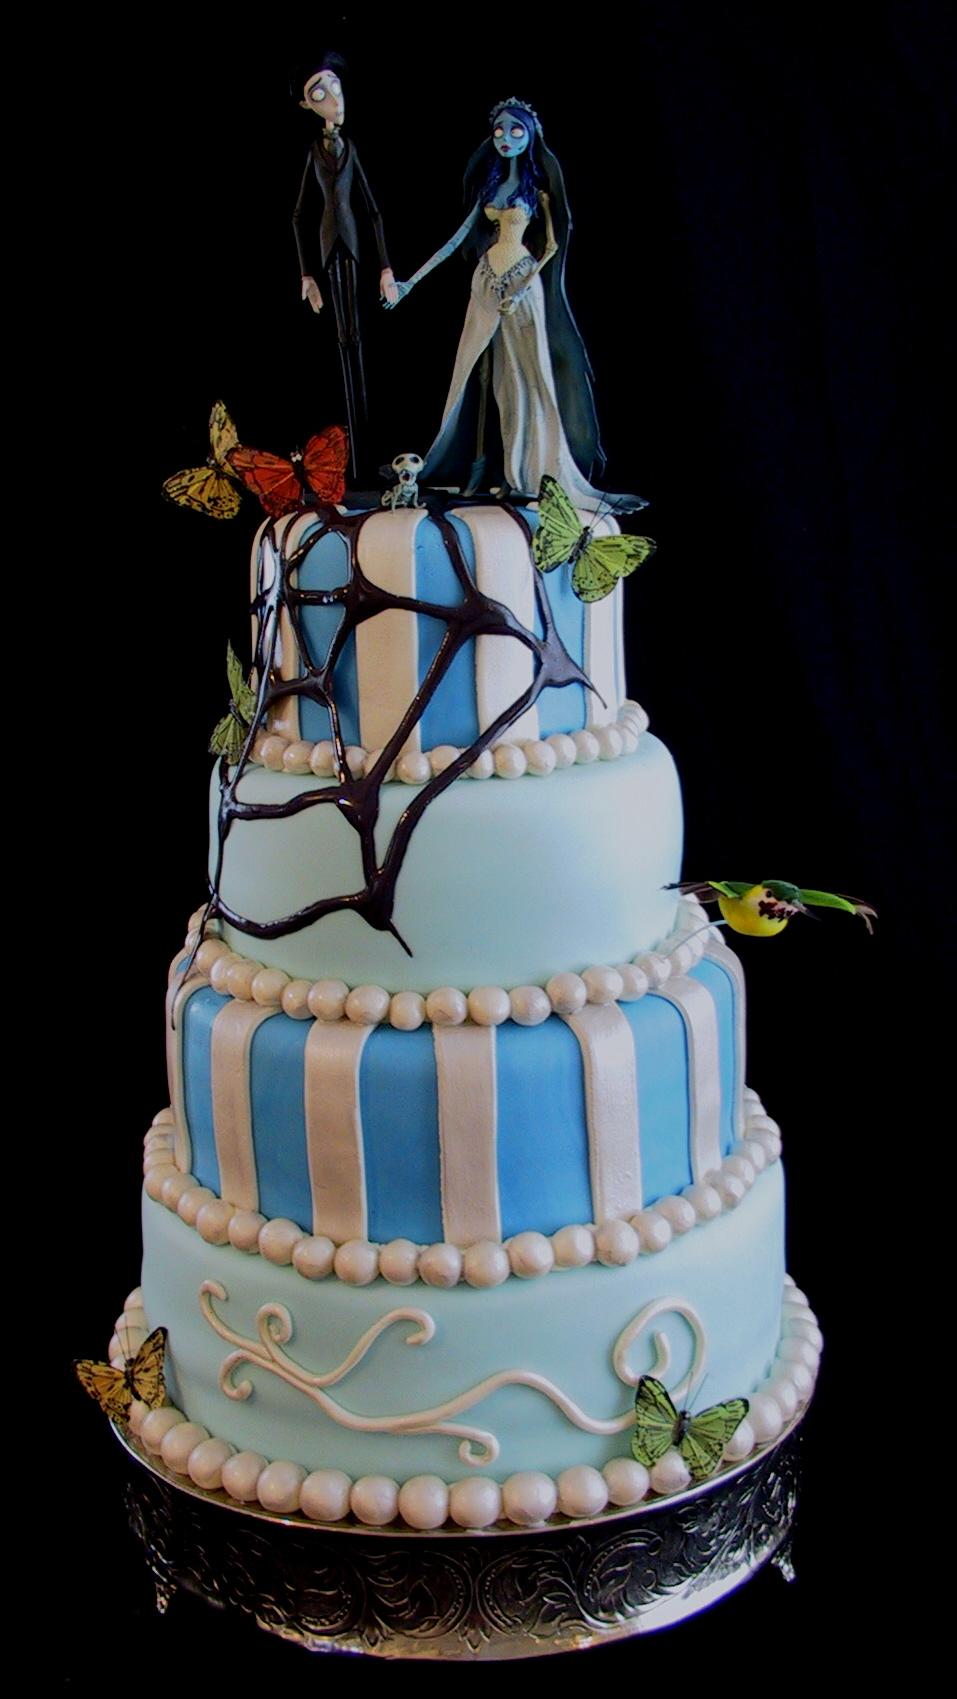 Fondant Corpse Bride Whimsical Wedding Cake Buffalo Trace